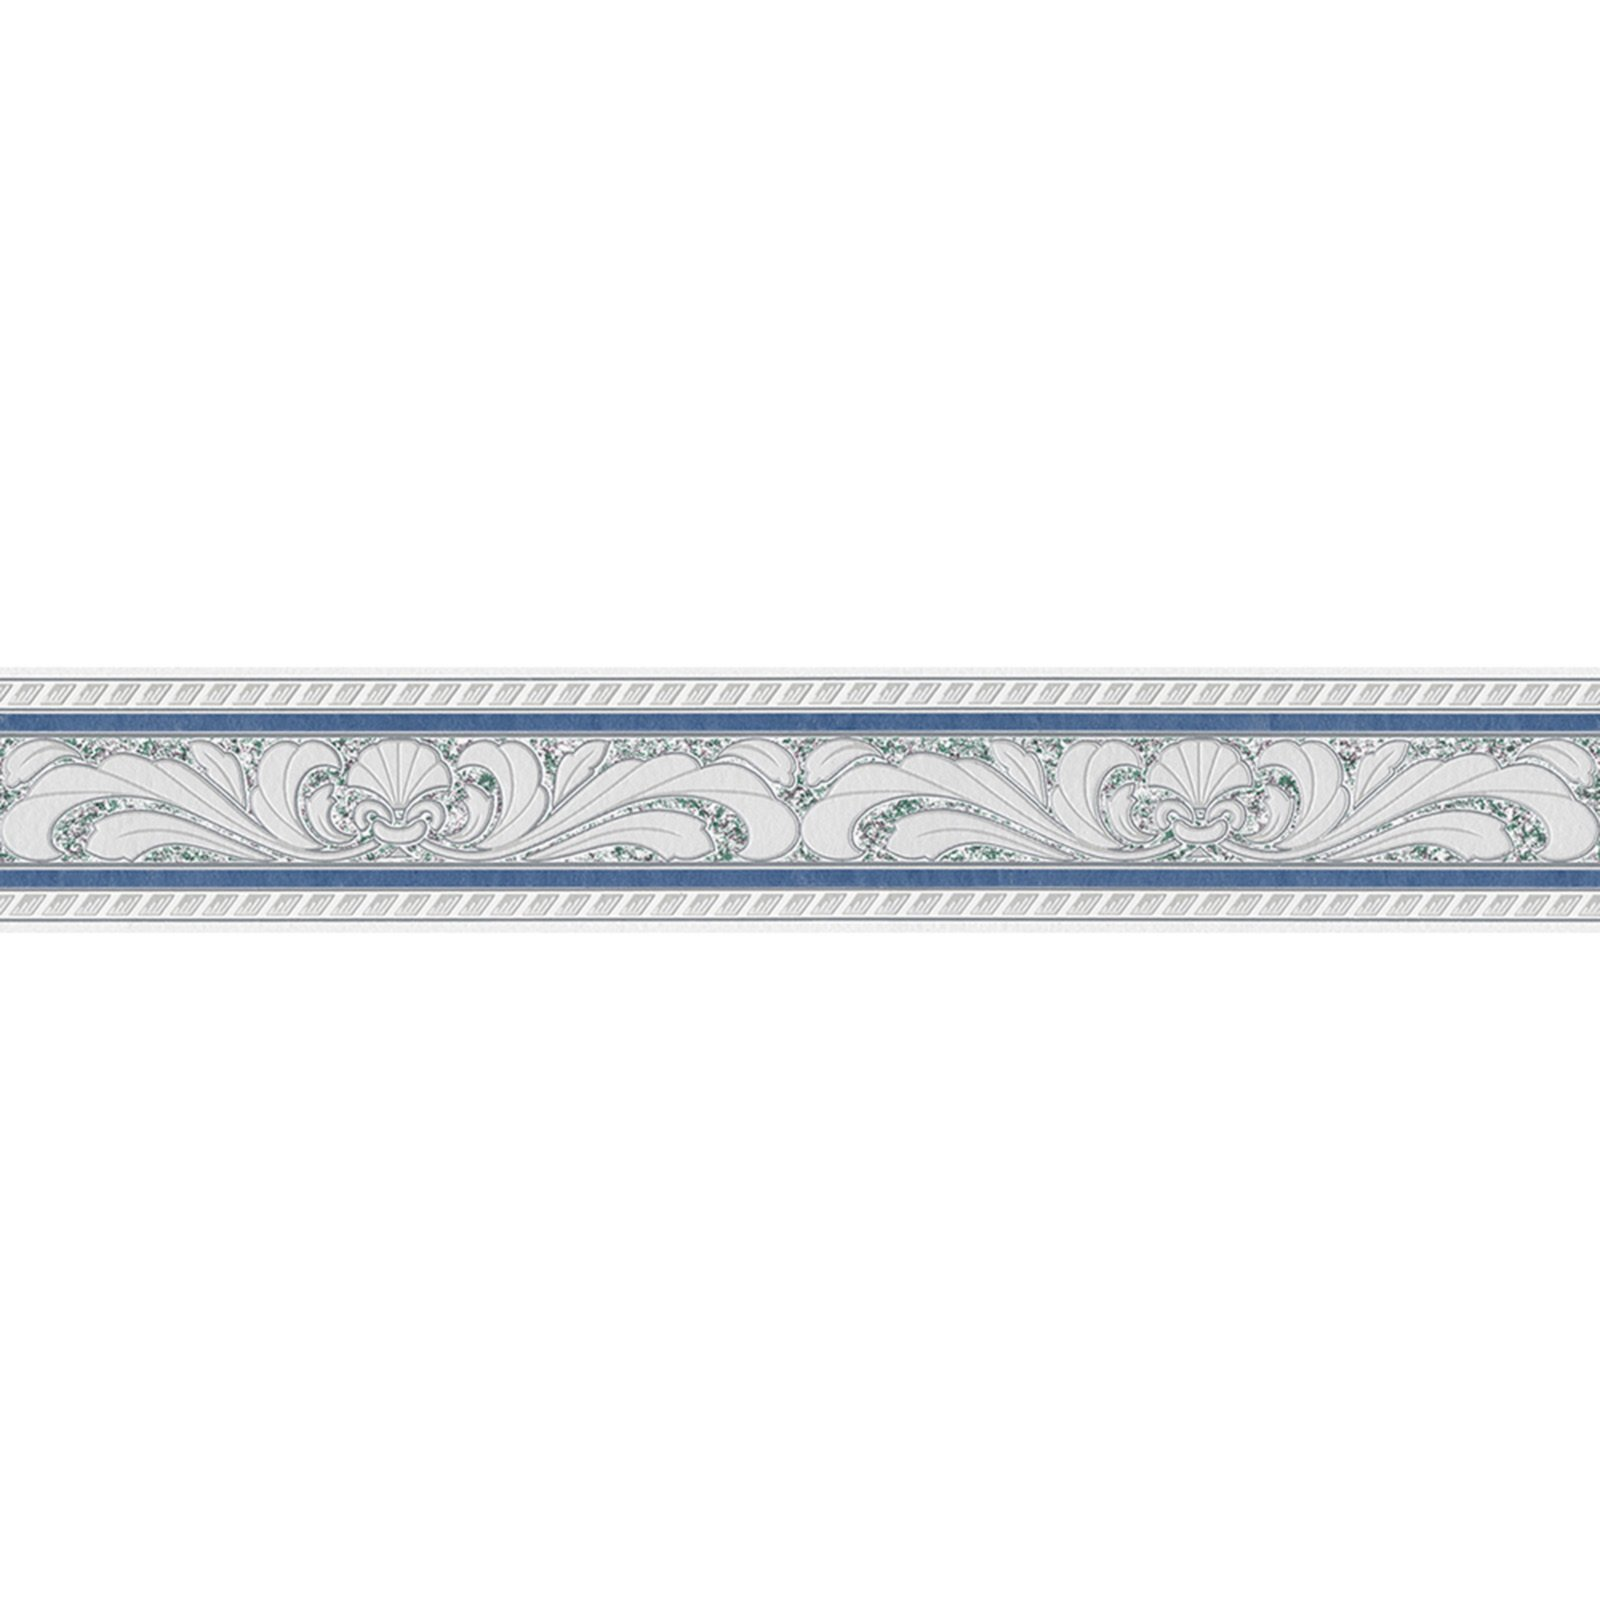 a s creation vinyl borte einzelbl tter 2003 blau 10 cm bord ren borten tapeten. Black Bedroom Furniture Sets. Home Design Ideas